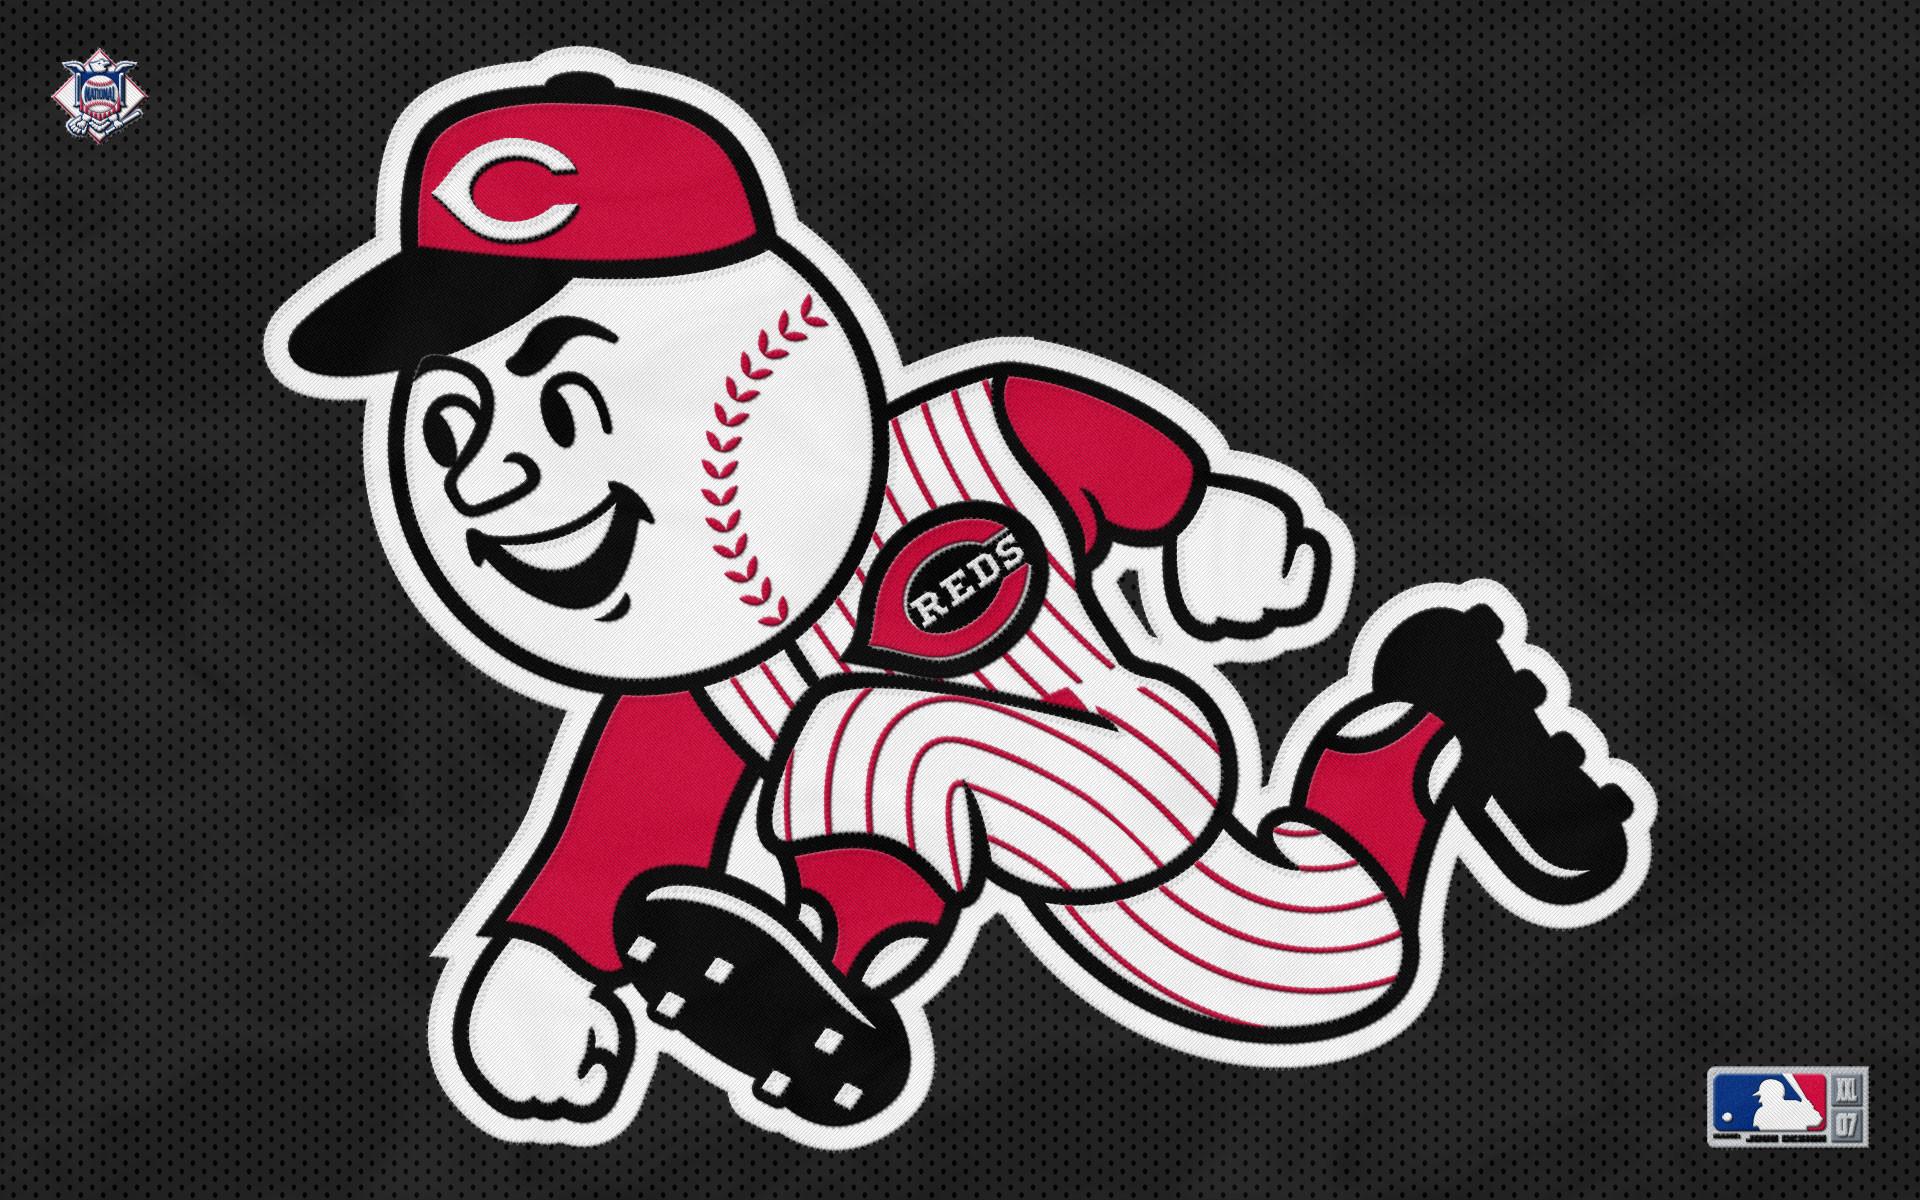 Cincinnati Reds – 3 to watch